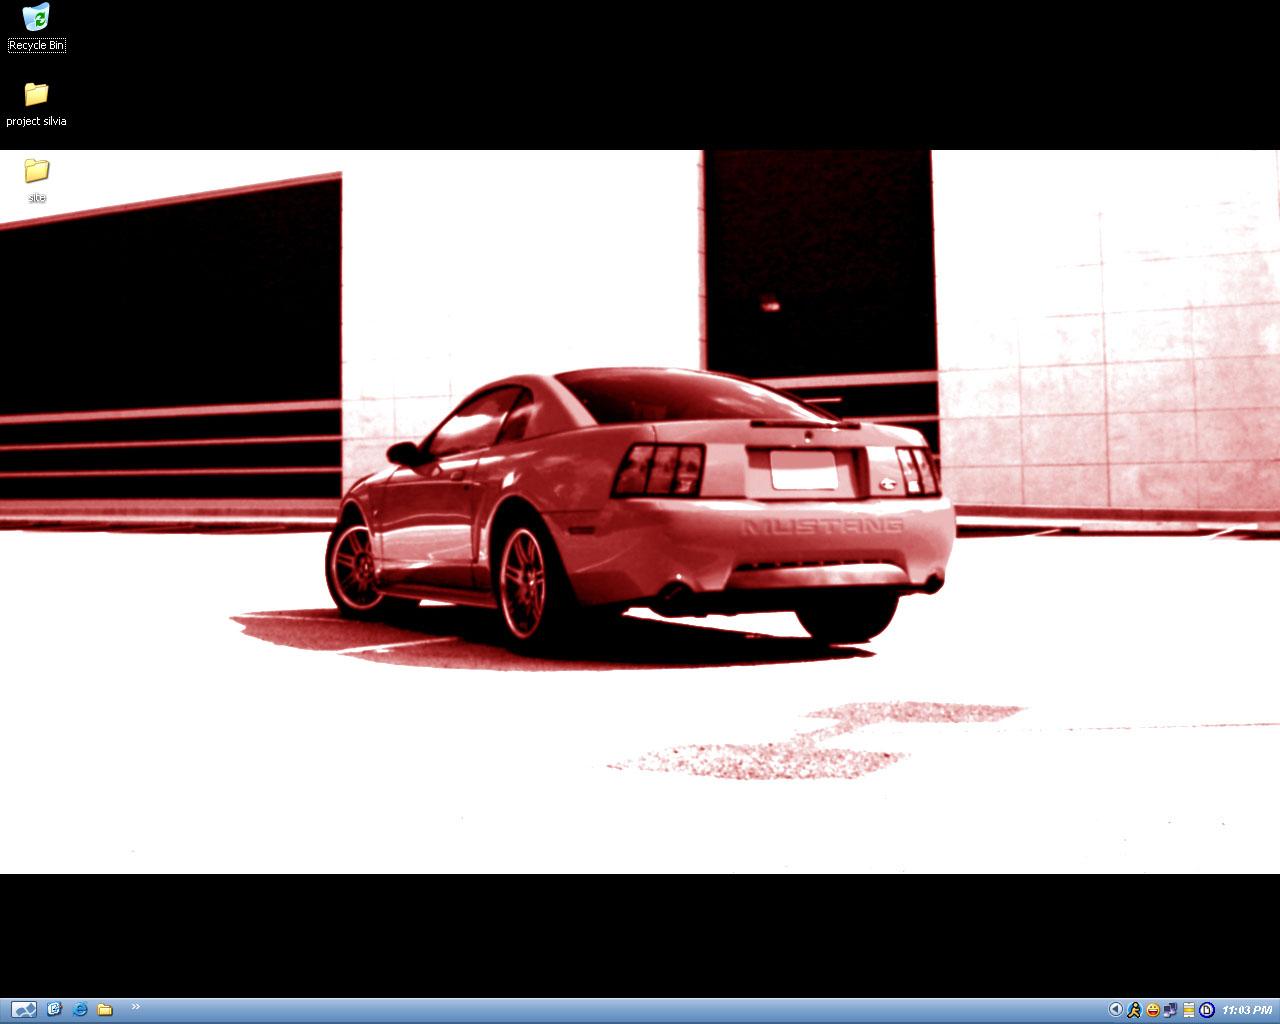 Click image for larger version  Name:desktopbg.jpg Views:88 Size:126.9 KB ID:11135